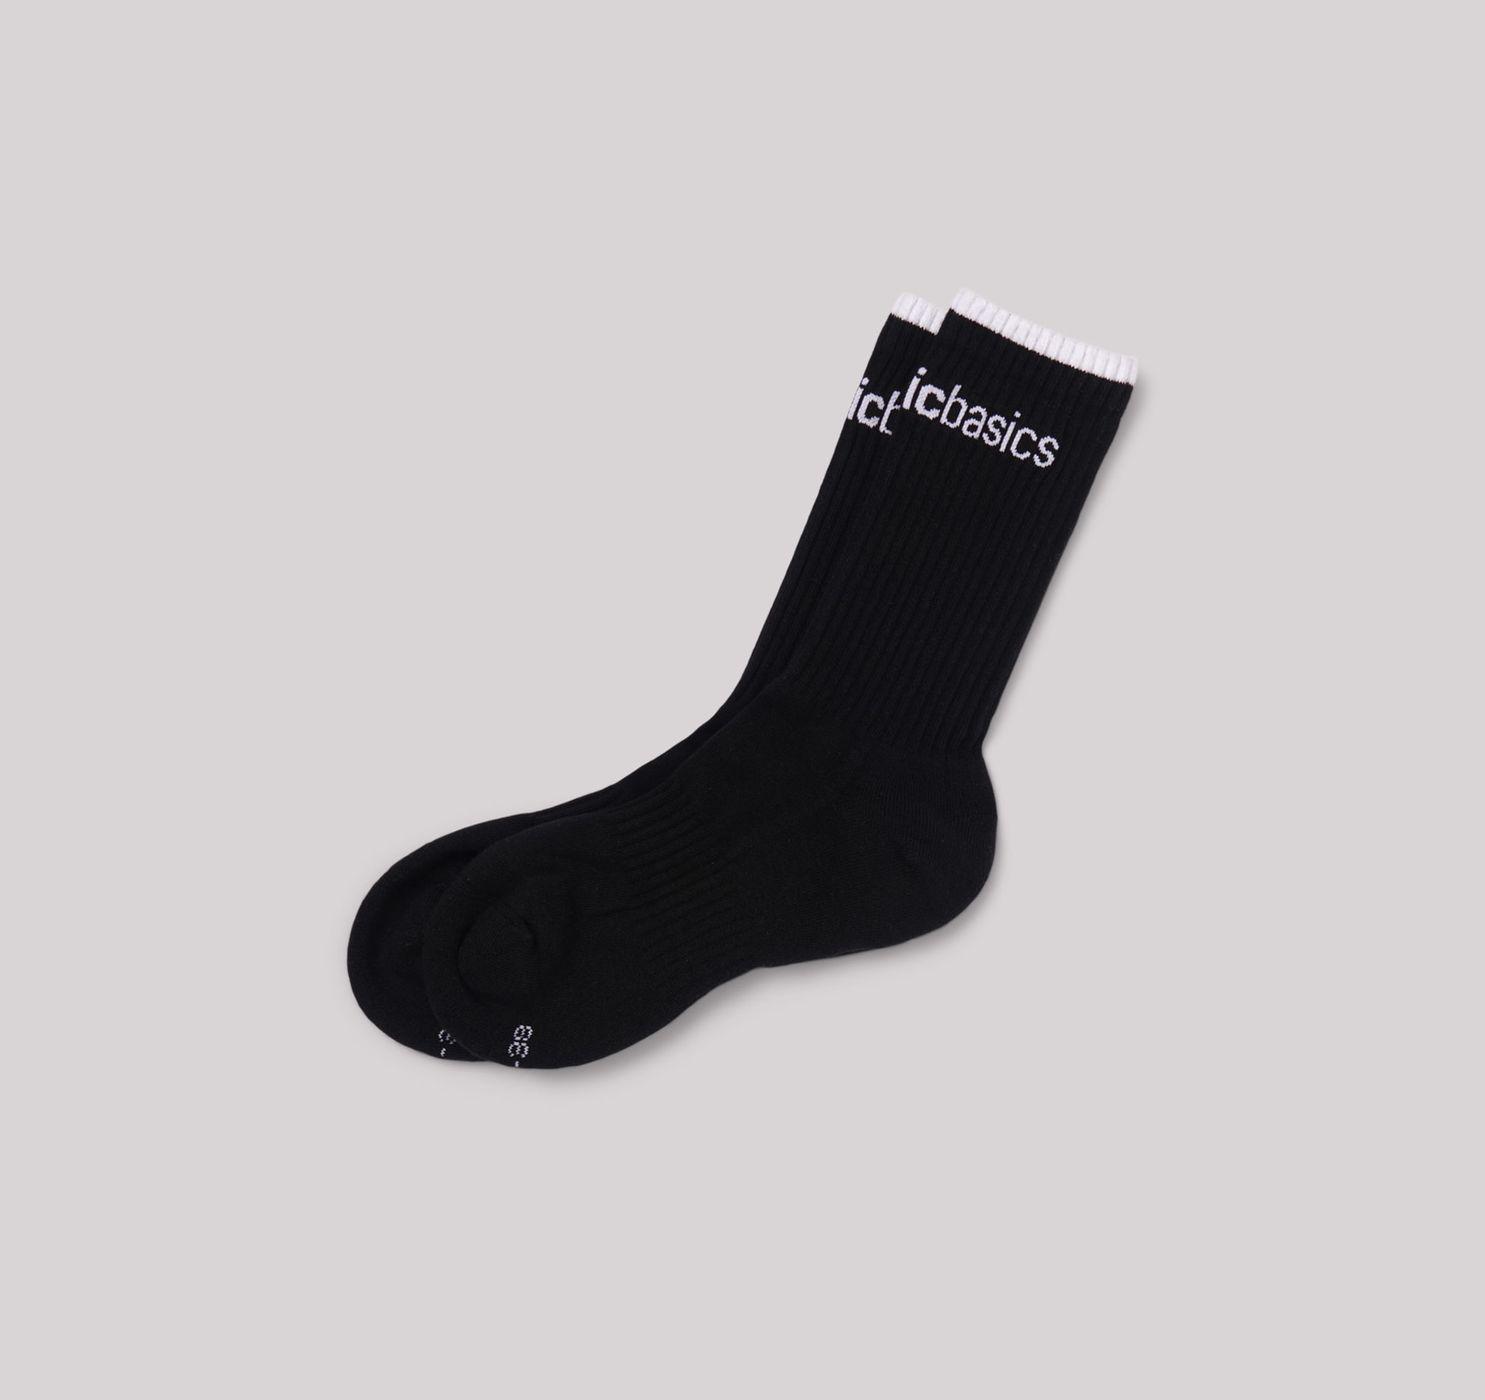 Organic Basics Active Tennis Socks